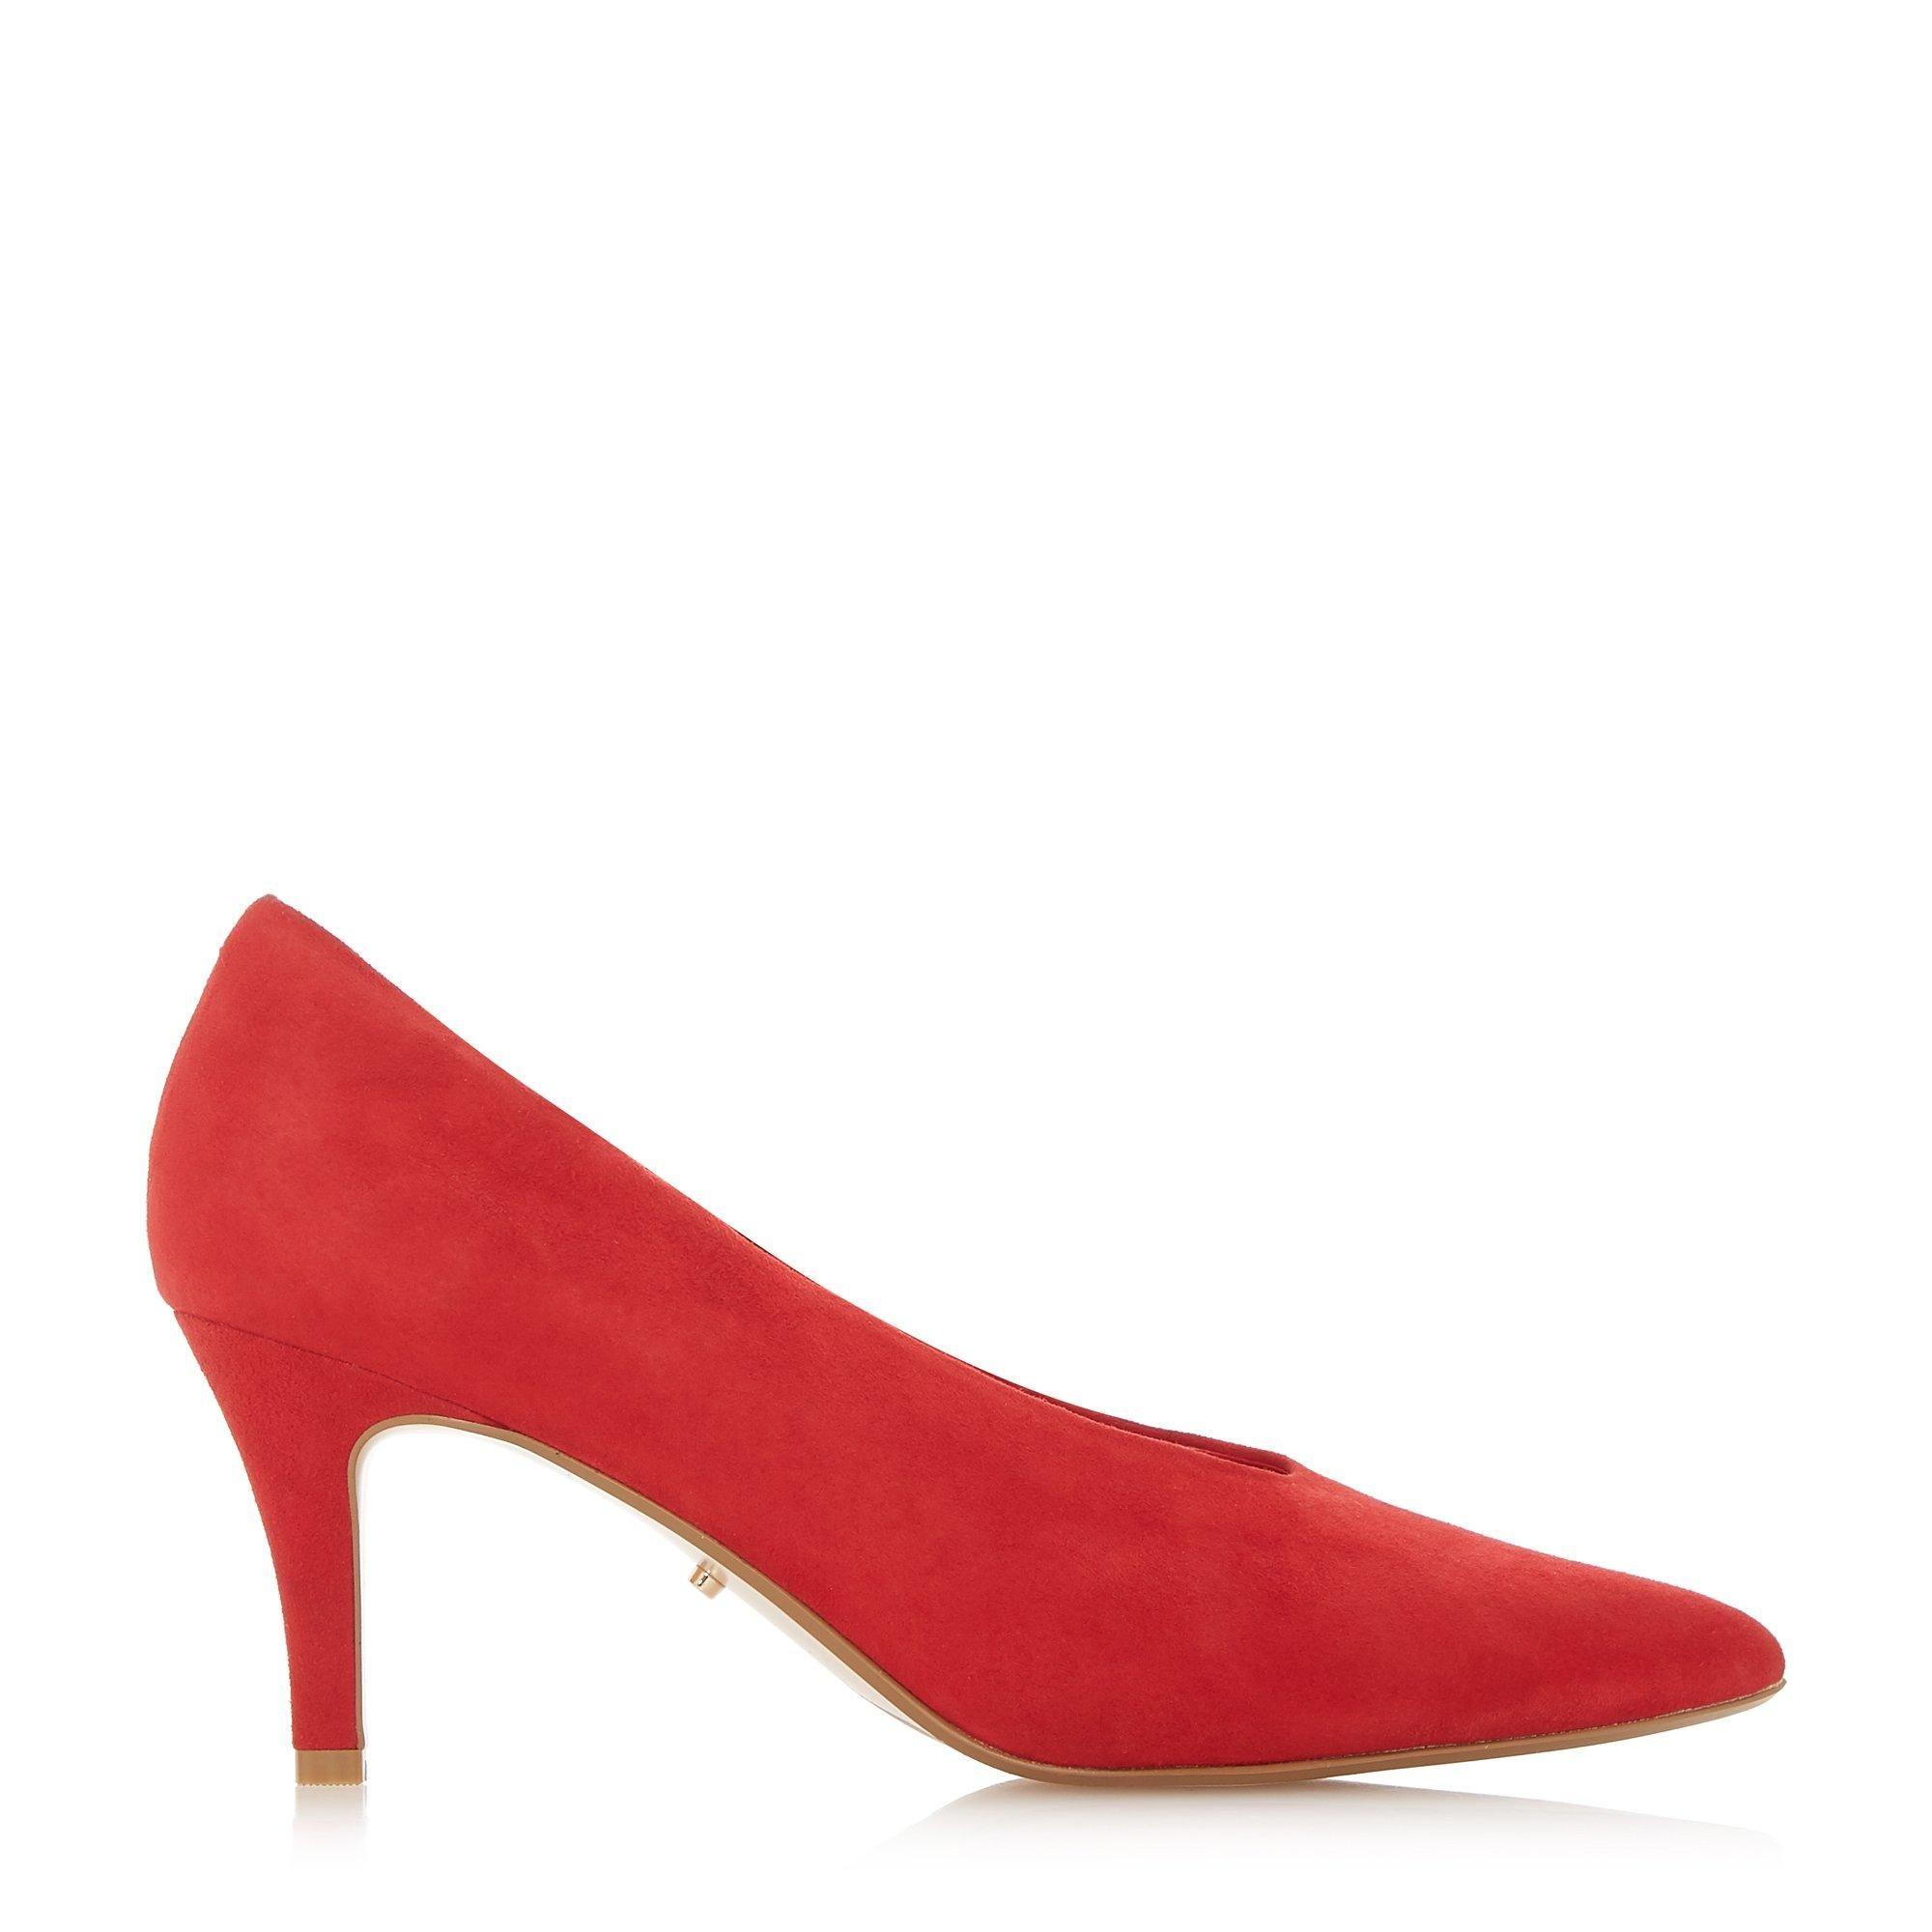 Dune Ladies ARI U-Cut High Vamp Pointed Toe Court Shoes